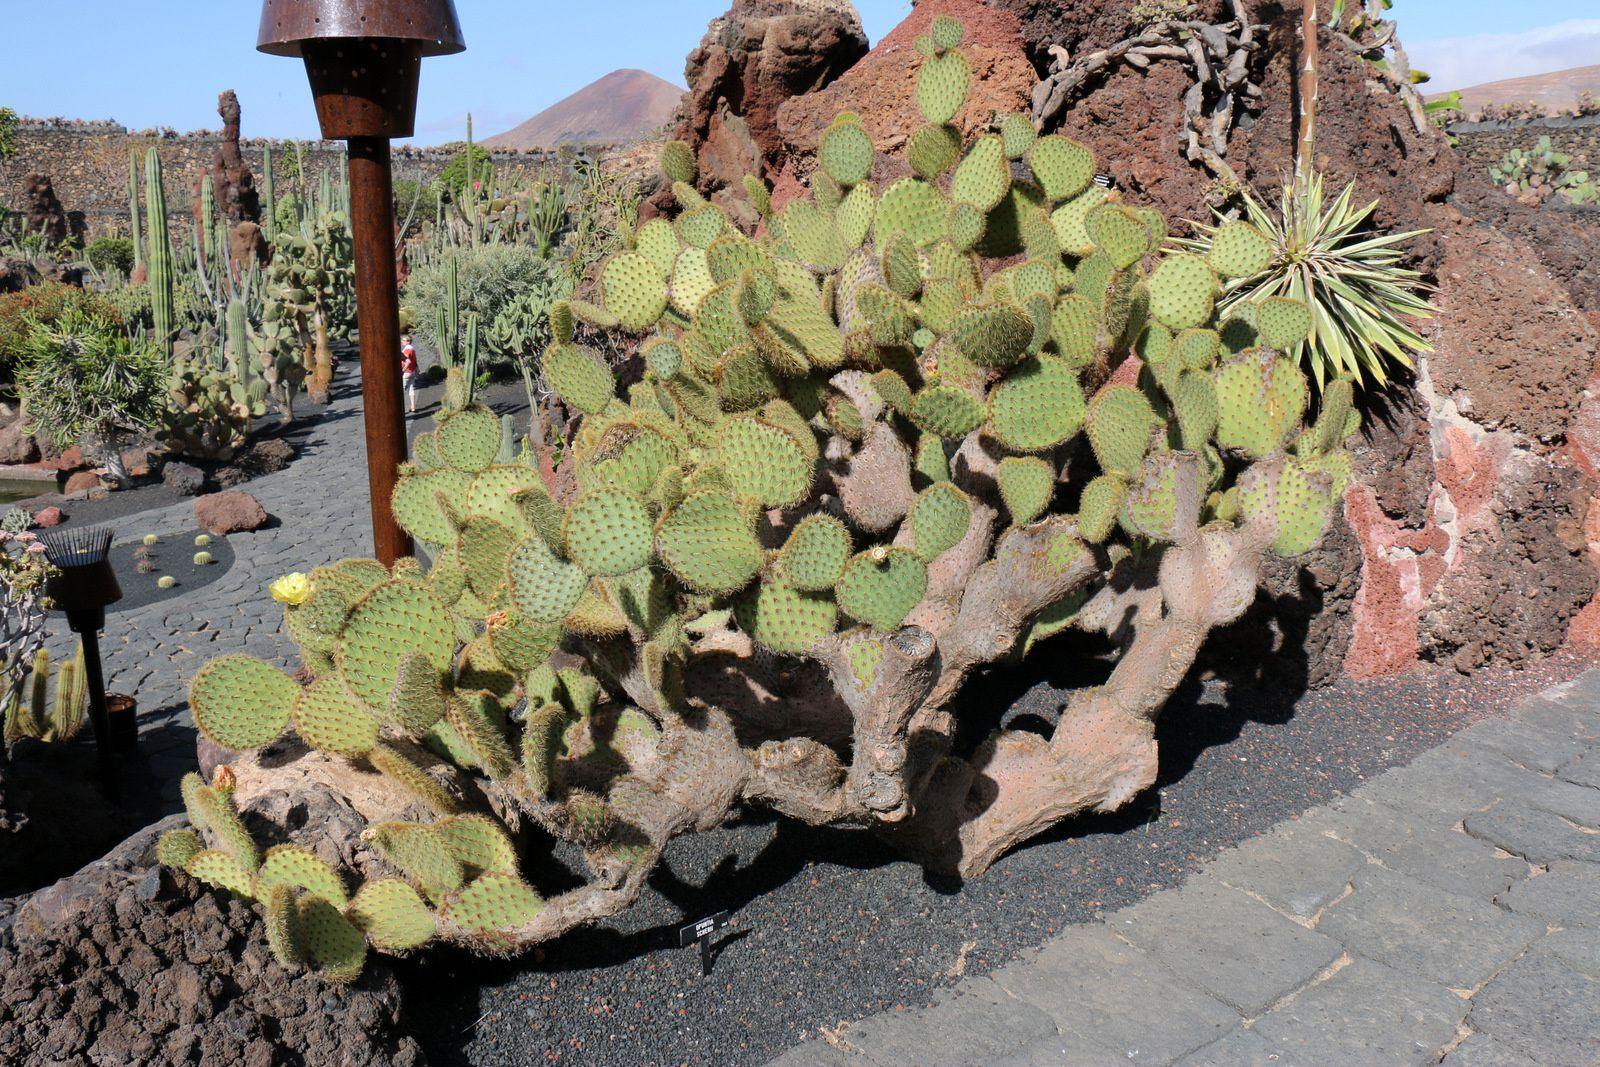 Opuntia Scherii, jardin de cactus (Lanzarote, Canaries)